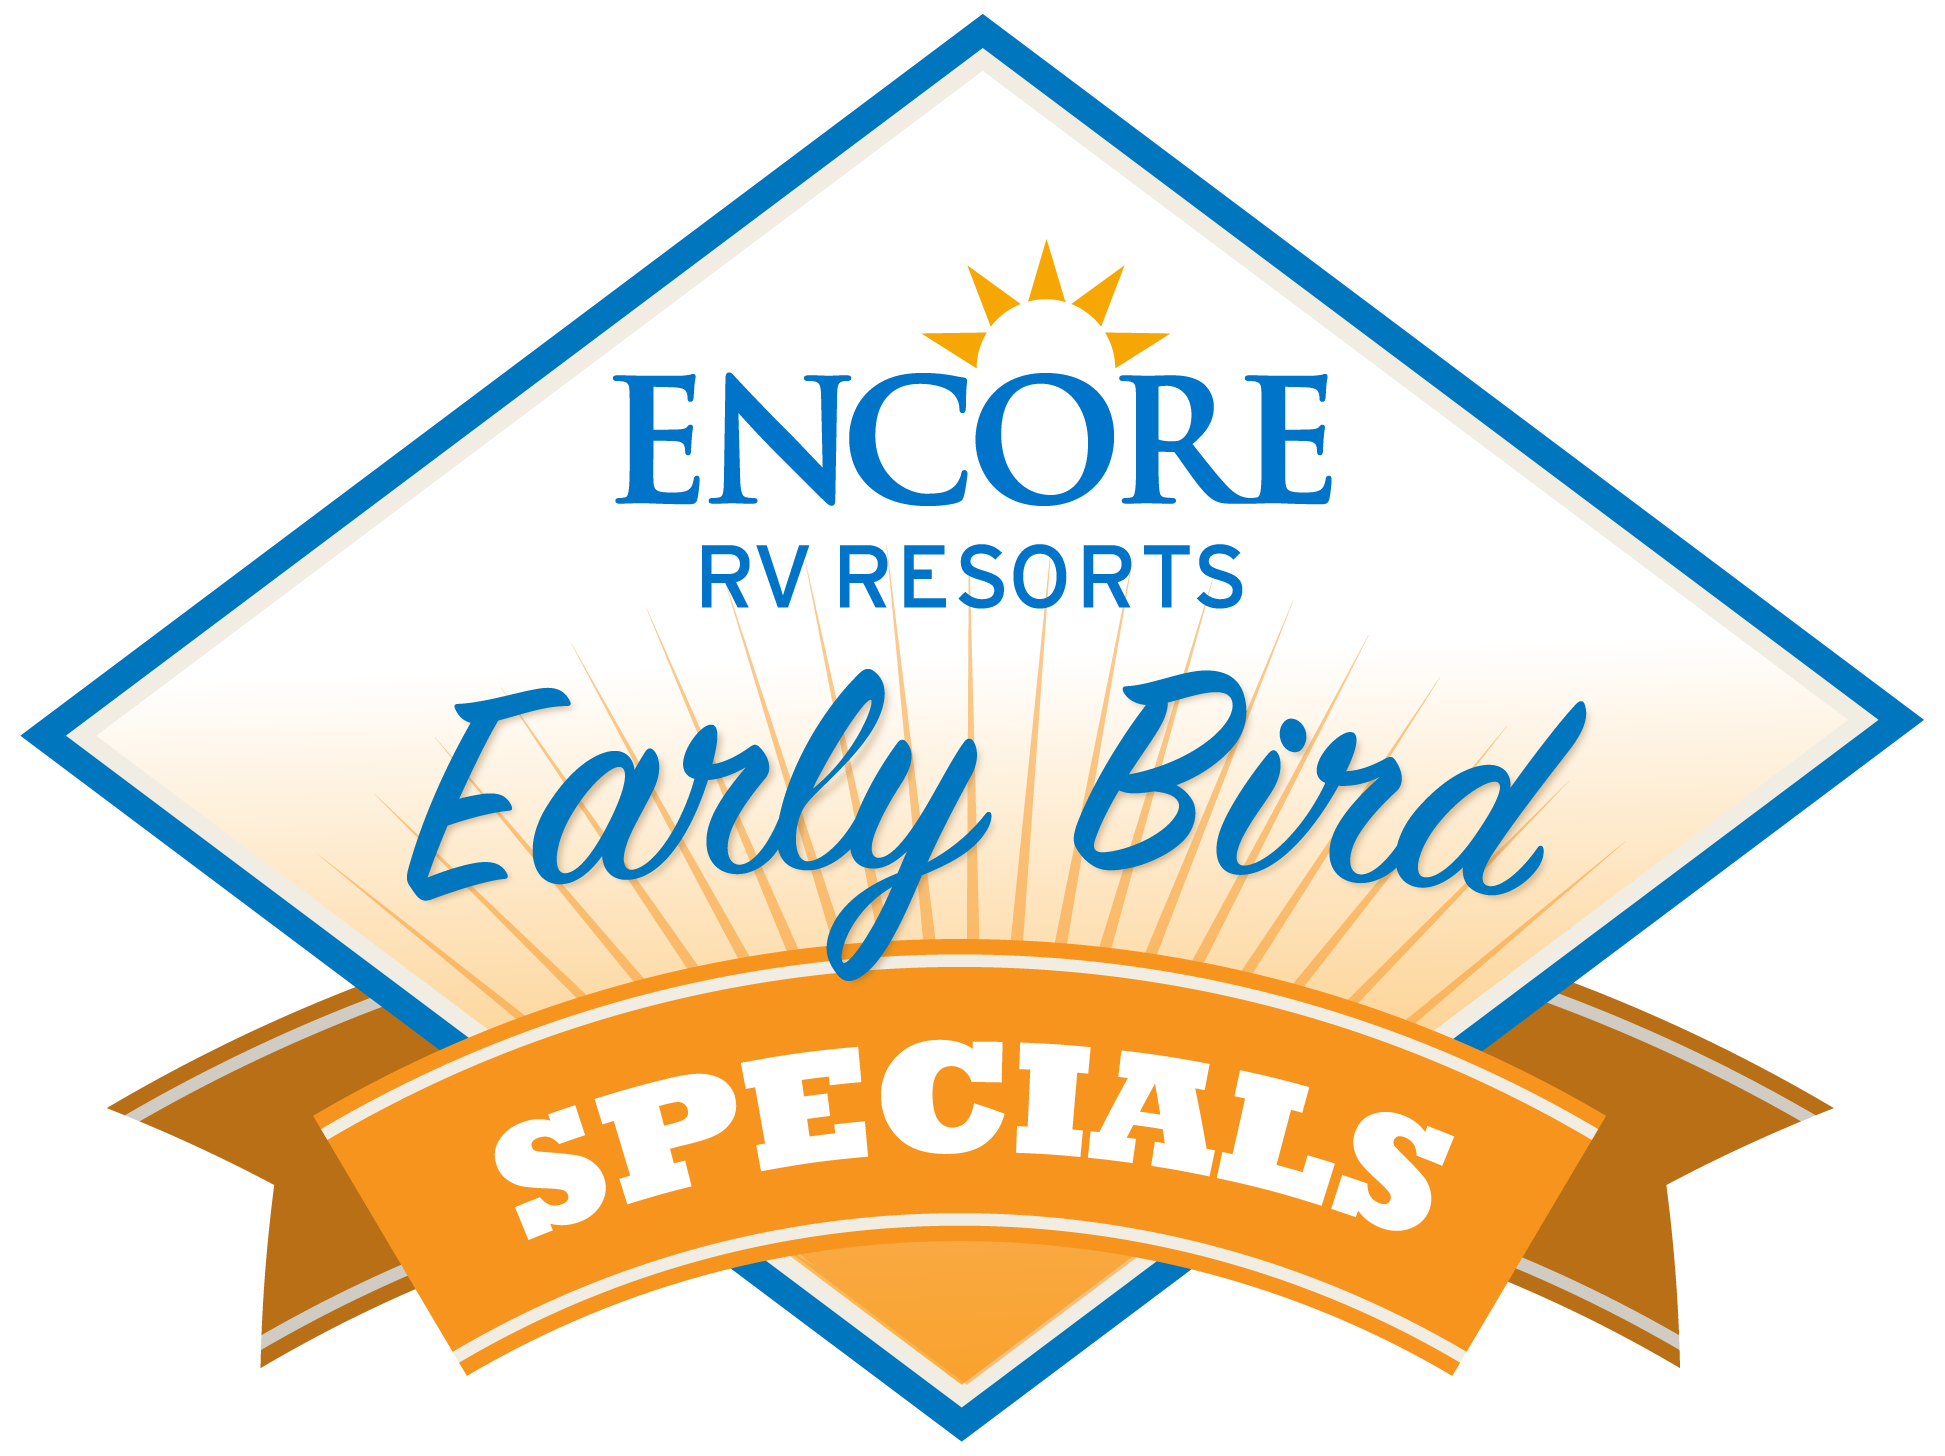 Fiesta Key RV Resort   Encore RV Resort in Long Key, Florida